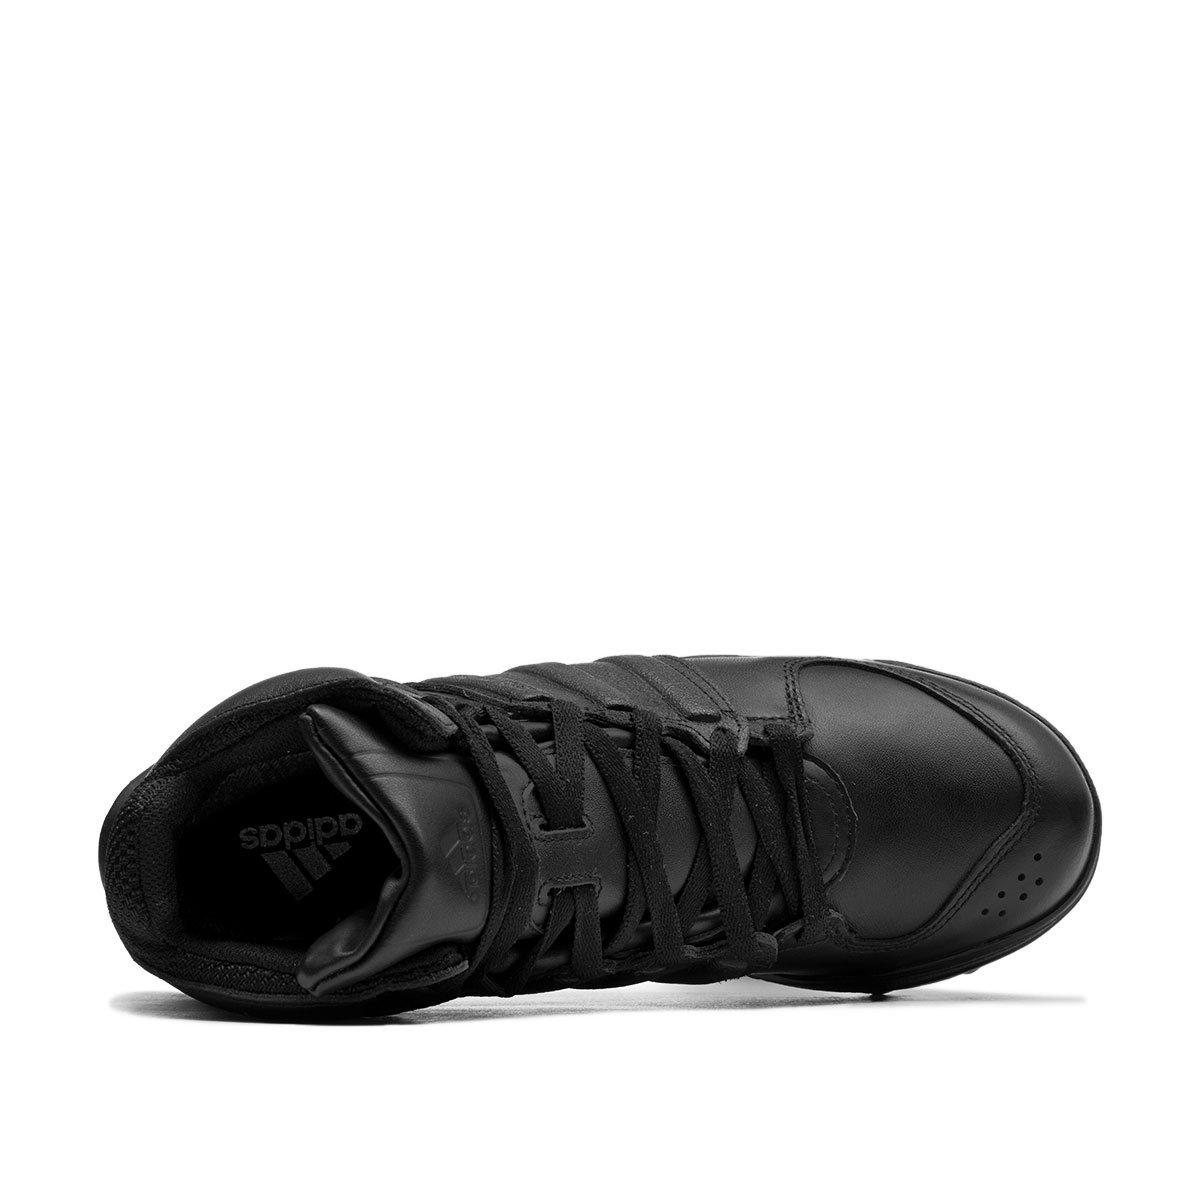 Adidas GSG-9.4